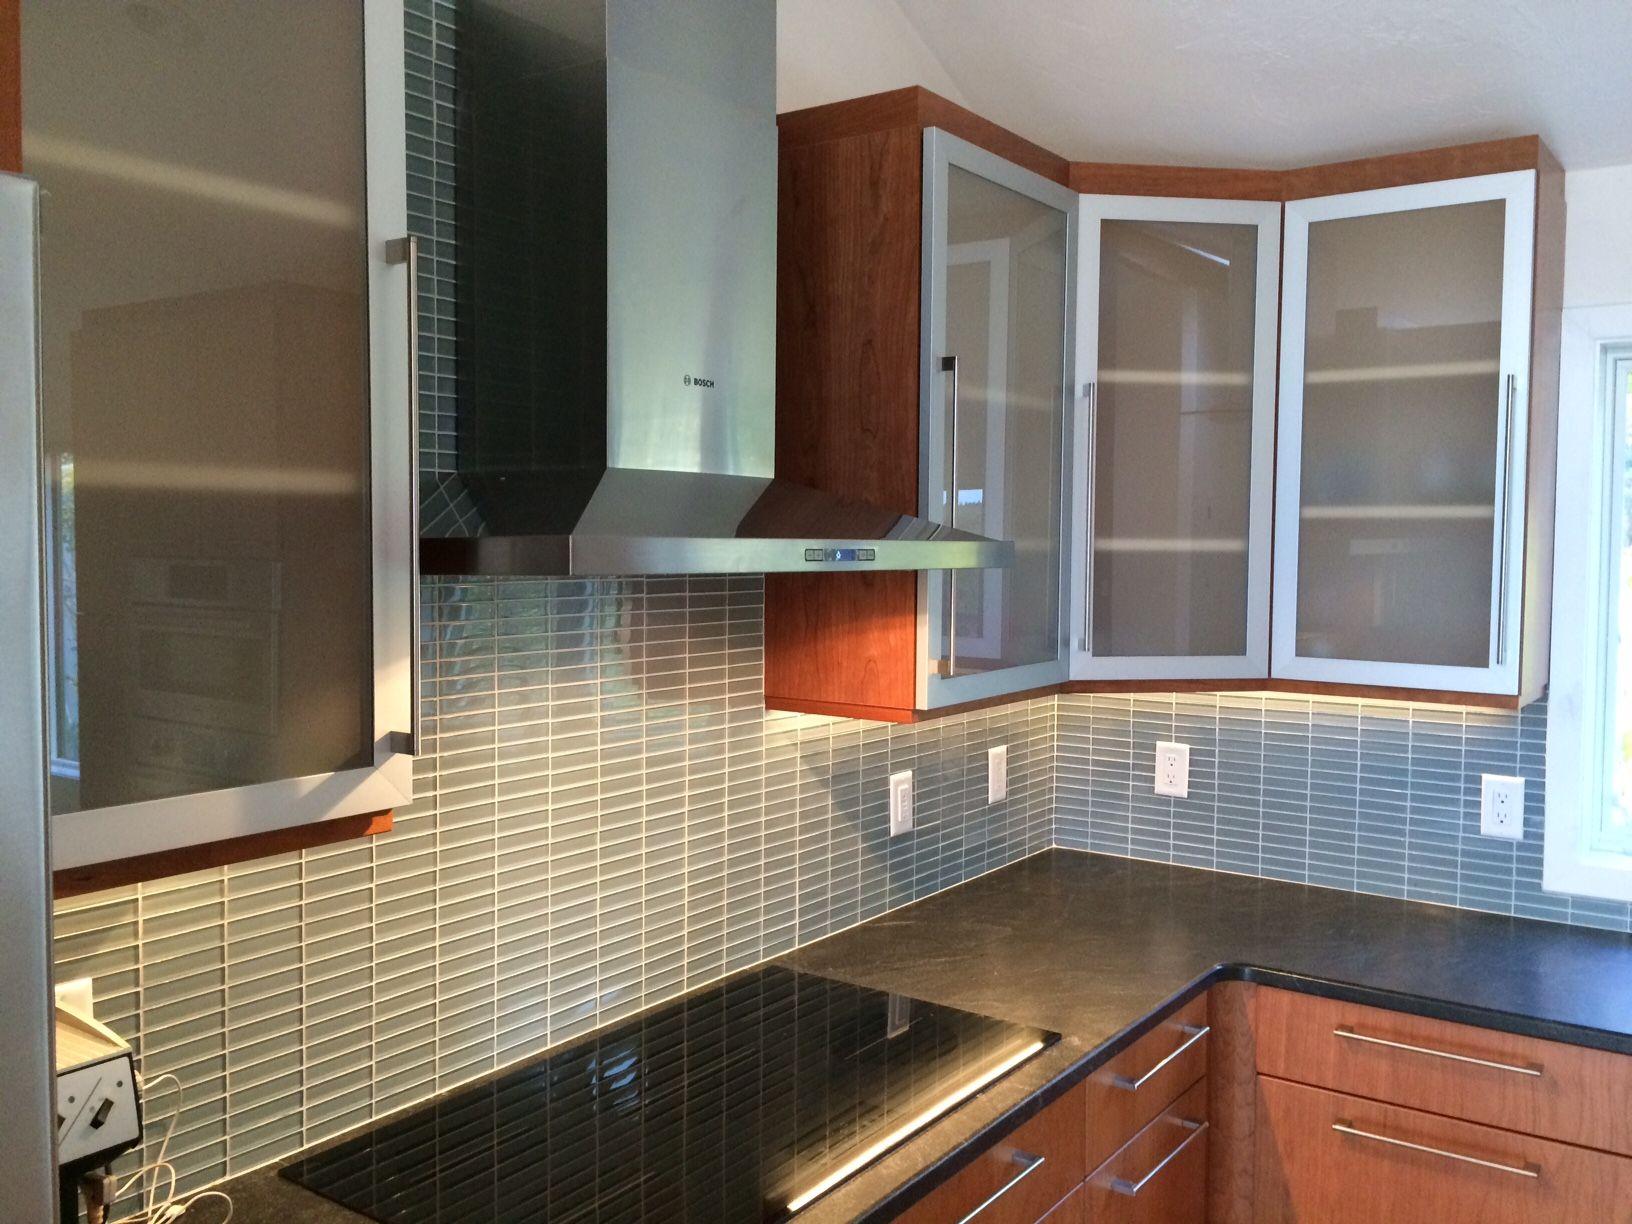 Vivaro Aluminum Kitchen Cabinet Doors in Natural Aluminum ...